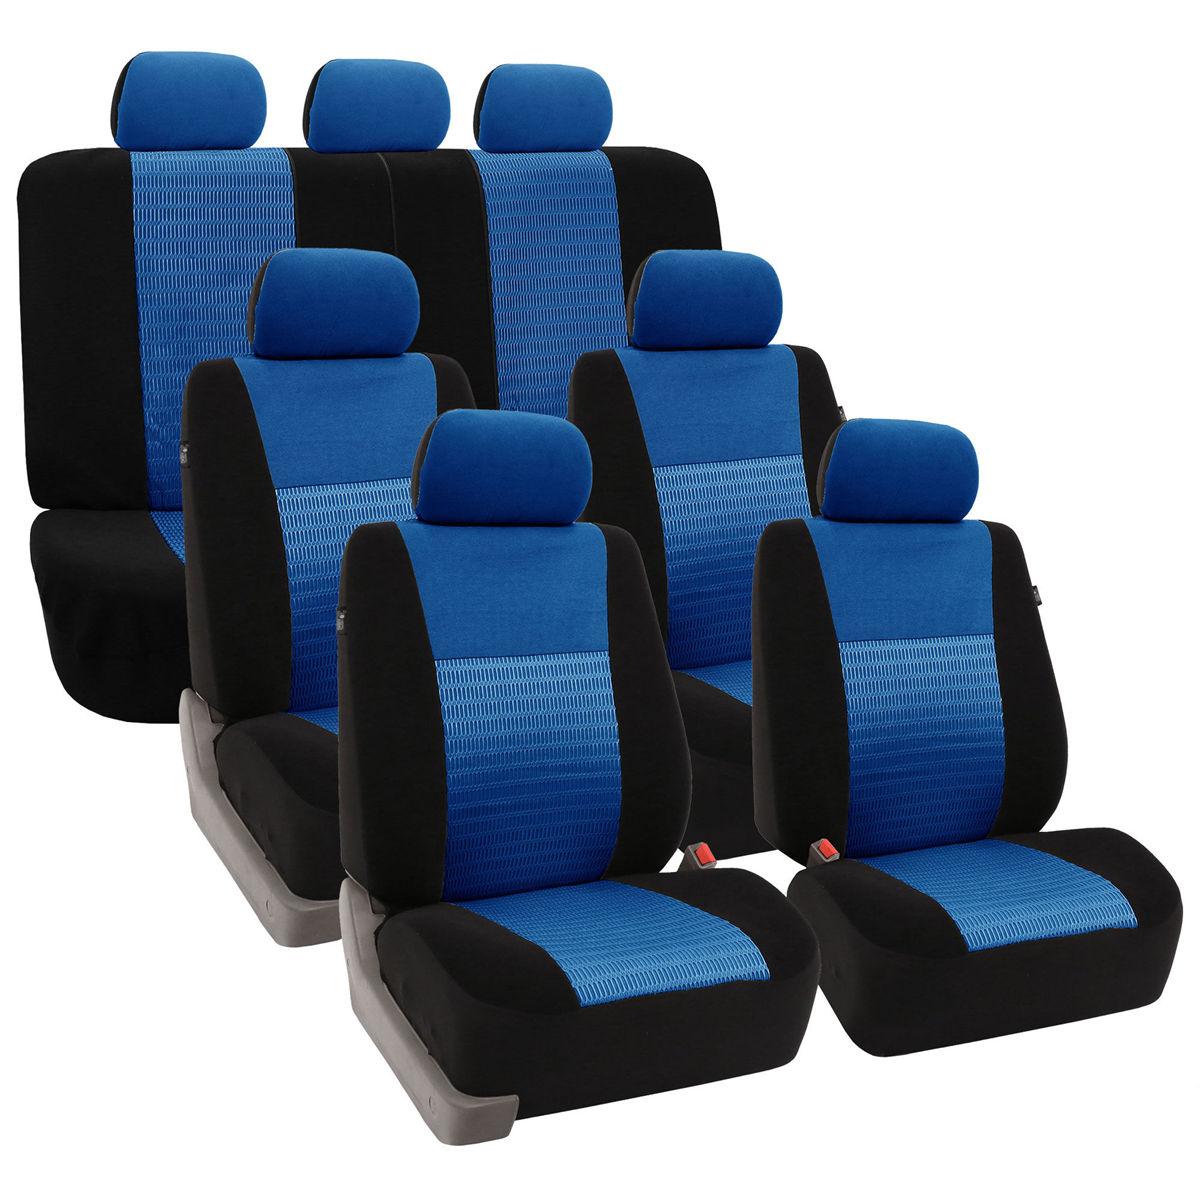 FB060217 blue car seat covers 01